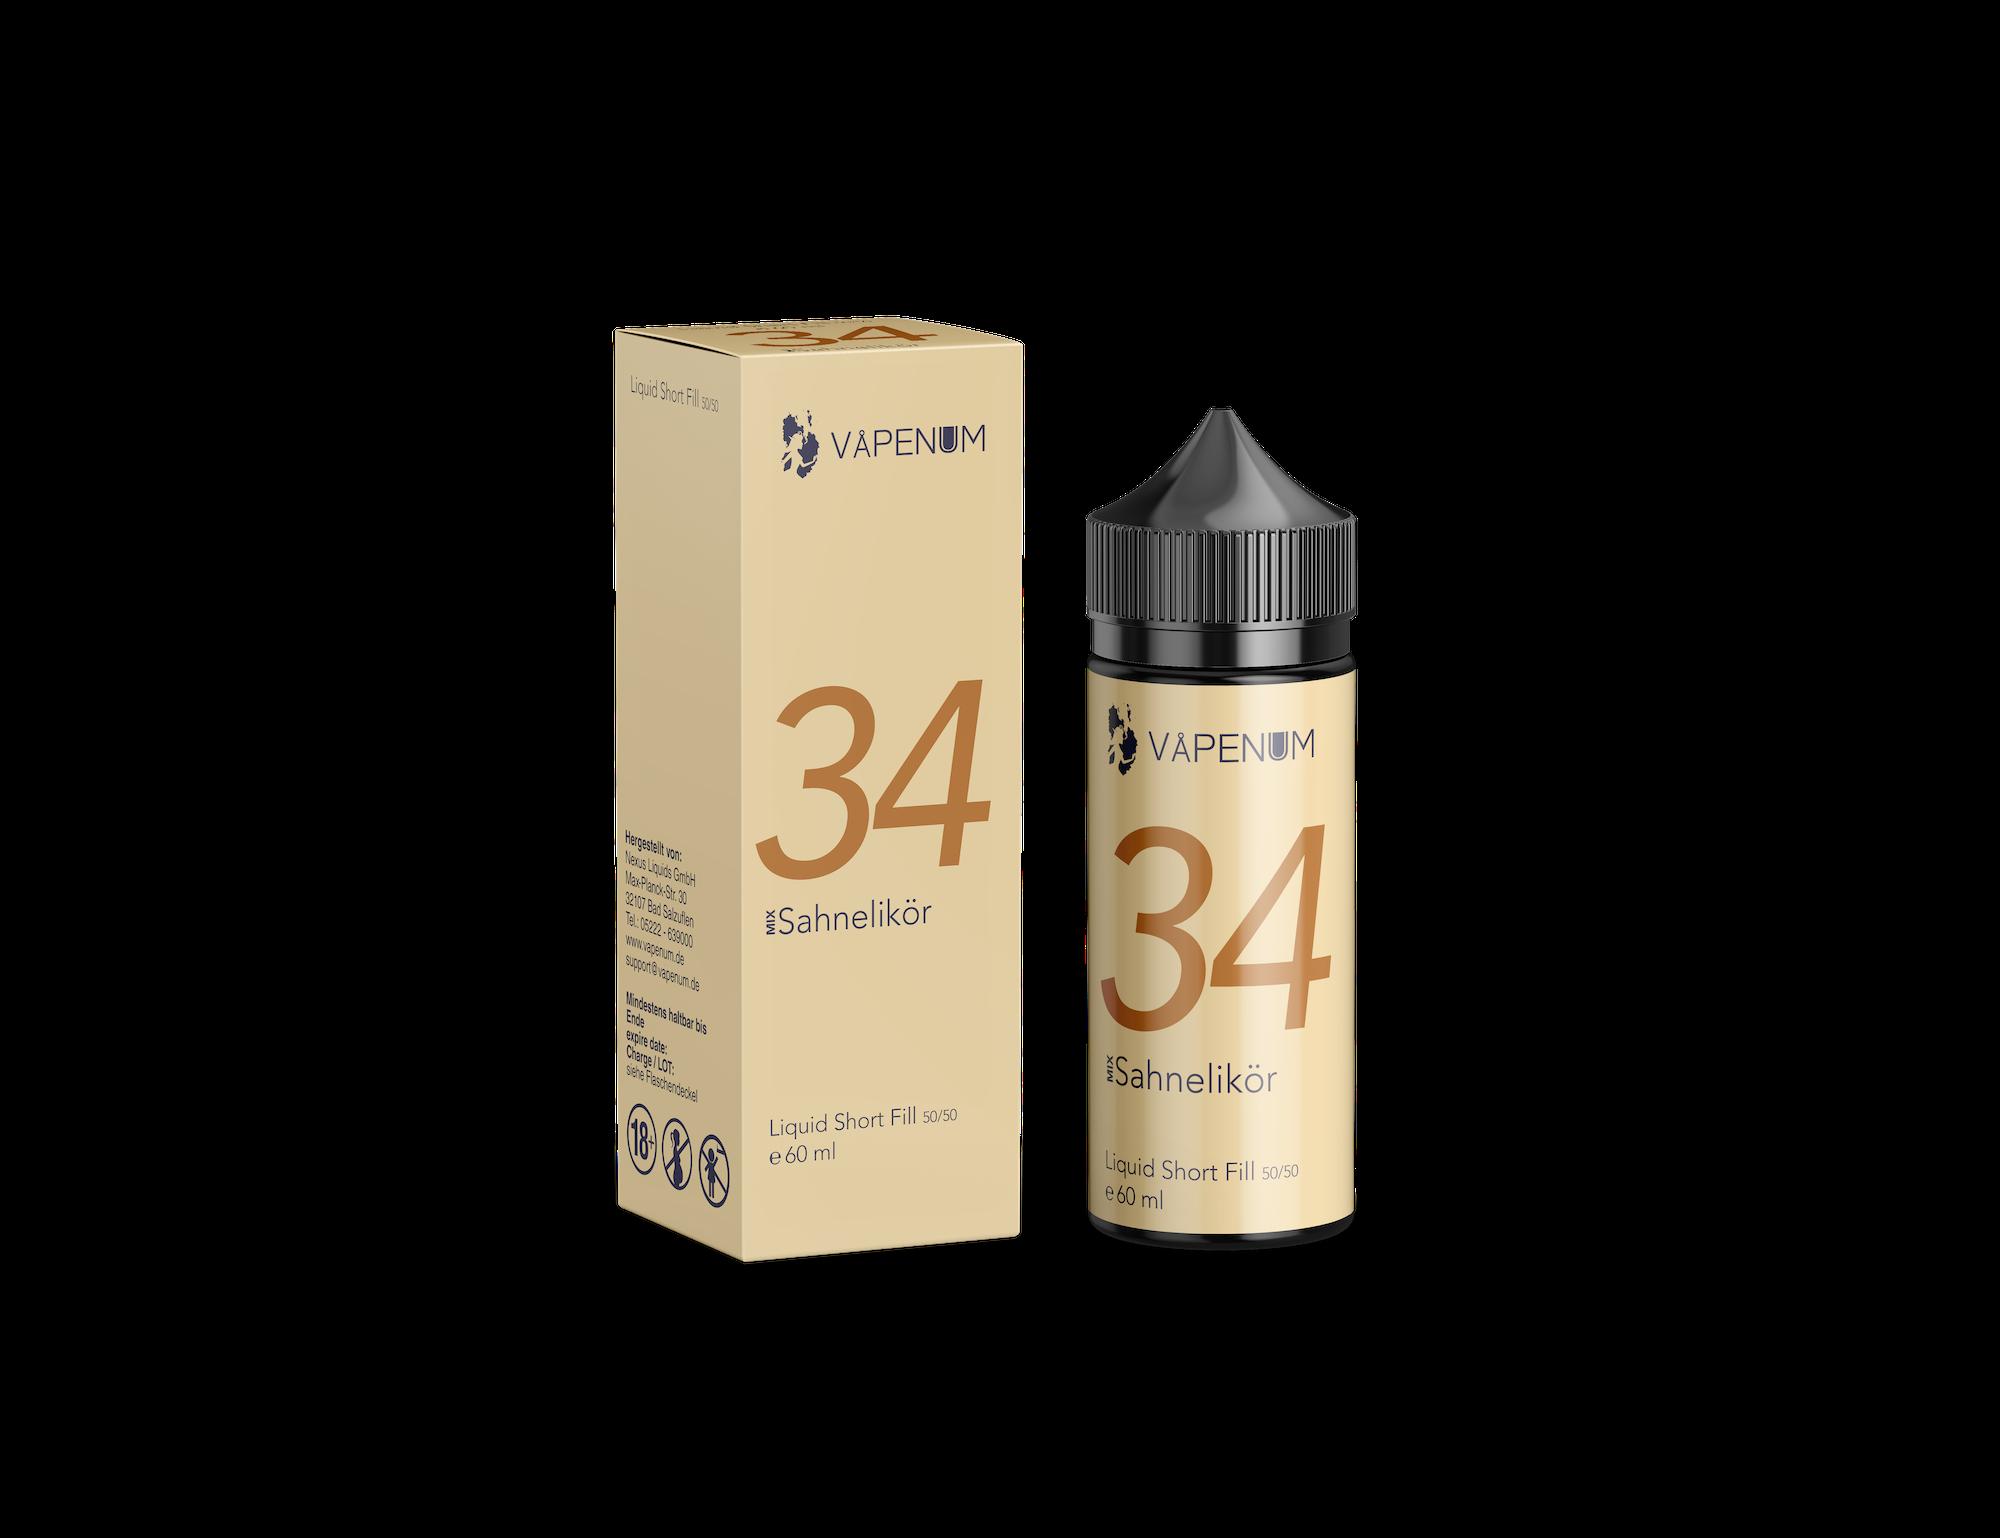 Vapenum Shortfill Mix 34 Sahnelikör